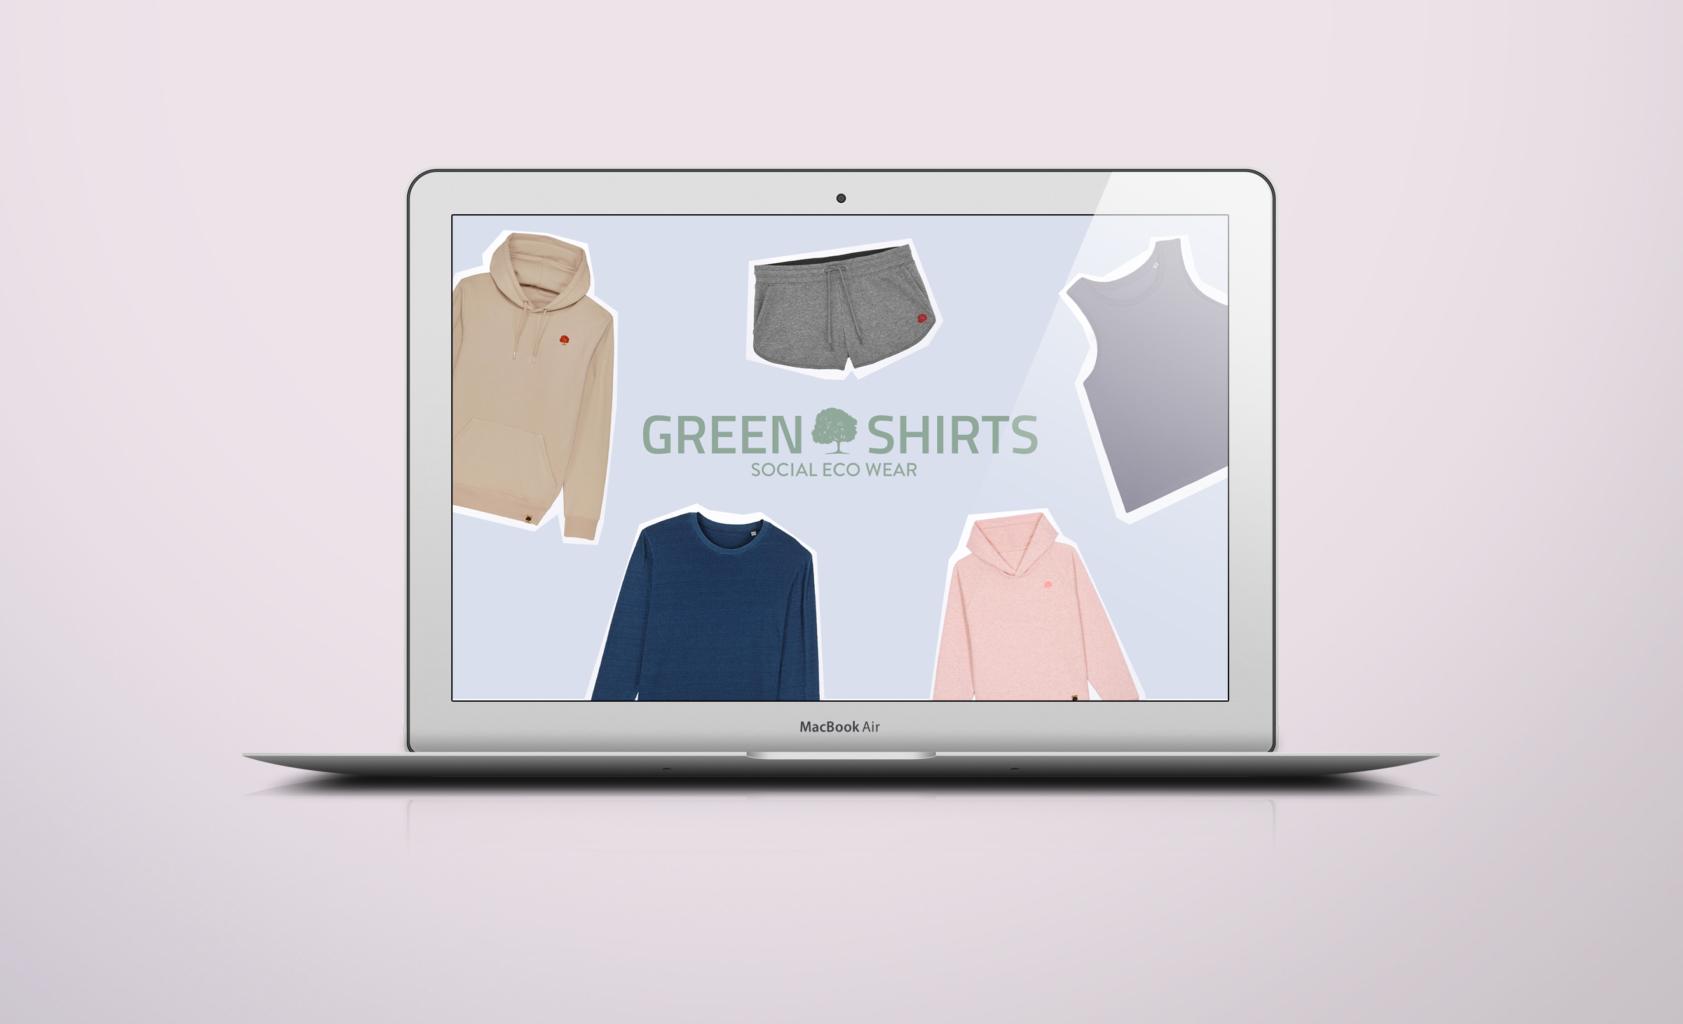 greenshirts green shirts fair fashion nachhaltige mode rabatt code gutschein vegan